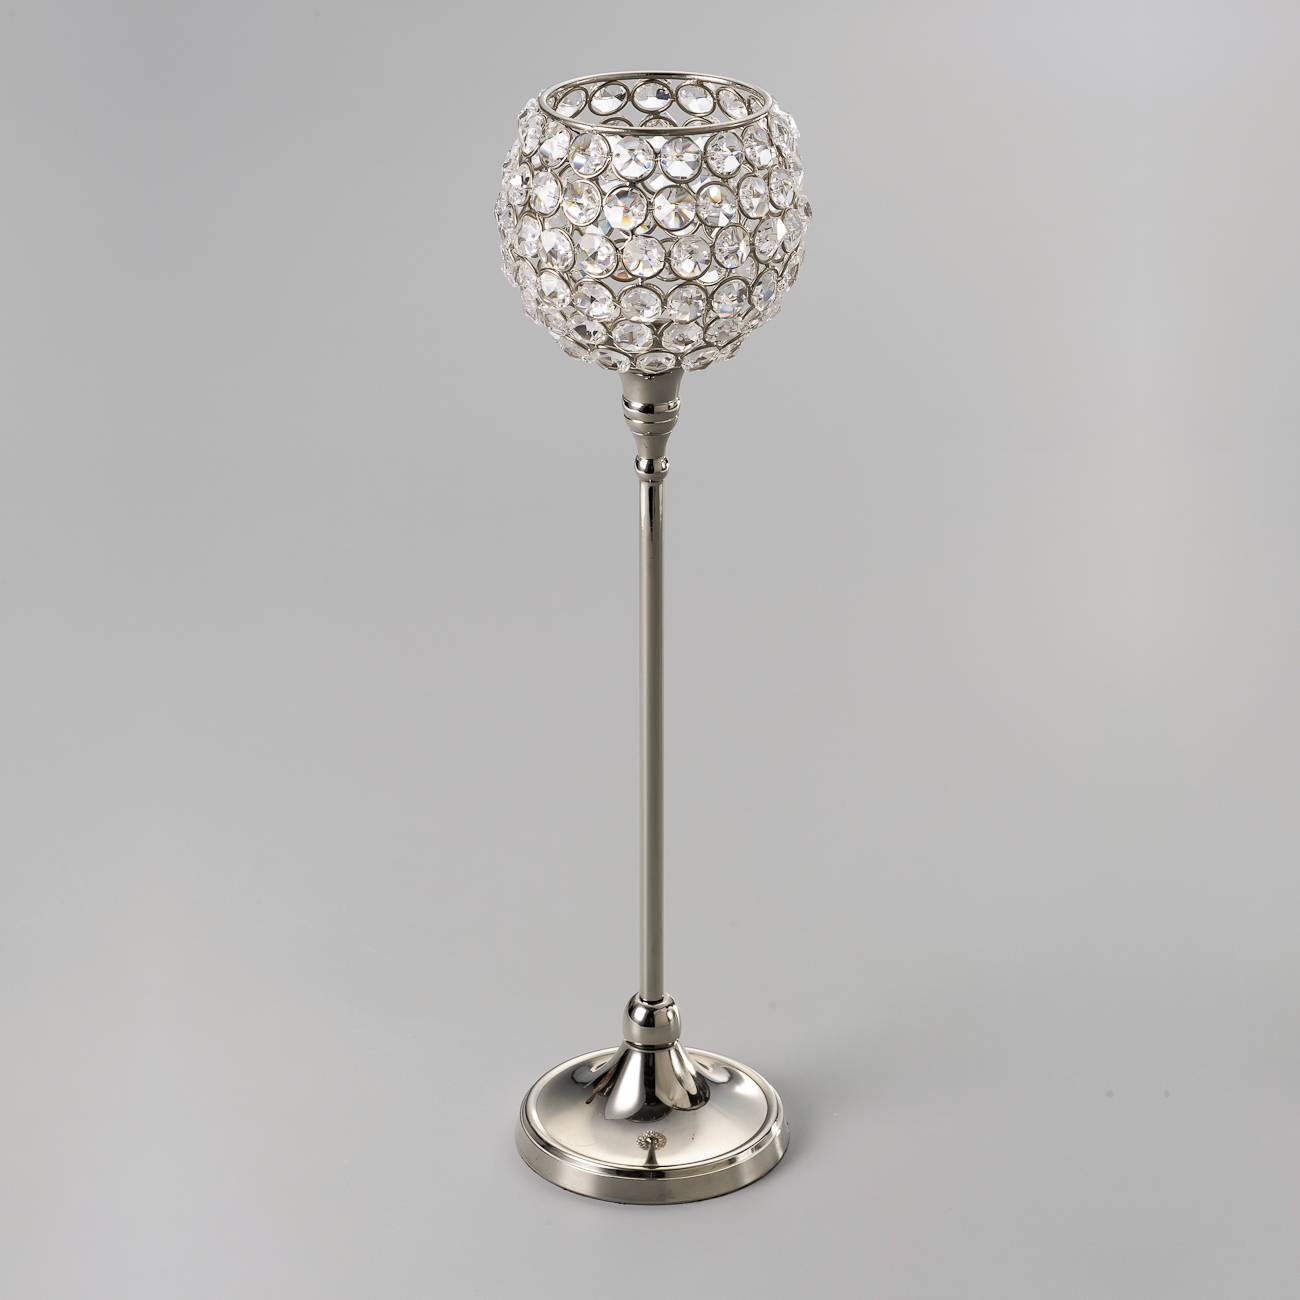 Castiçal Luxo Grande Prateado em Cristal e Ferro - Delhi Wolff - 42,5x7,5 cm